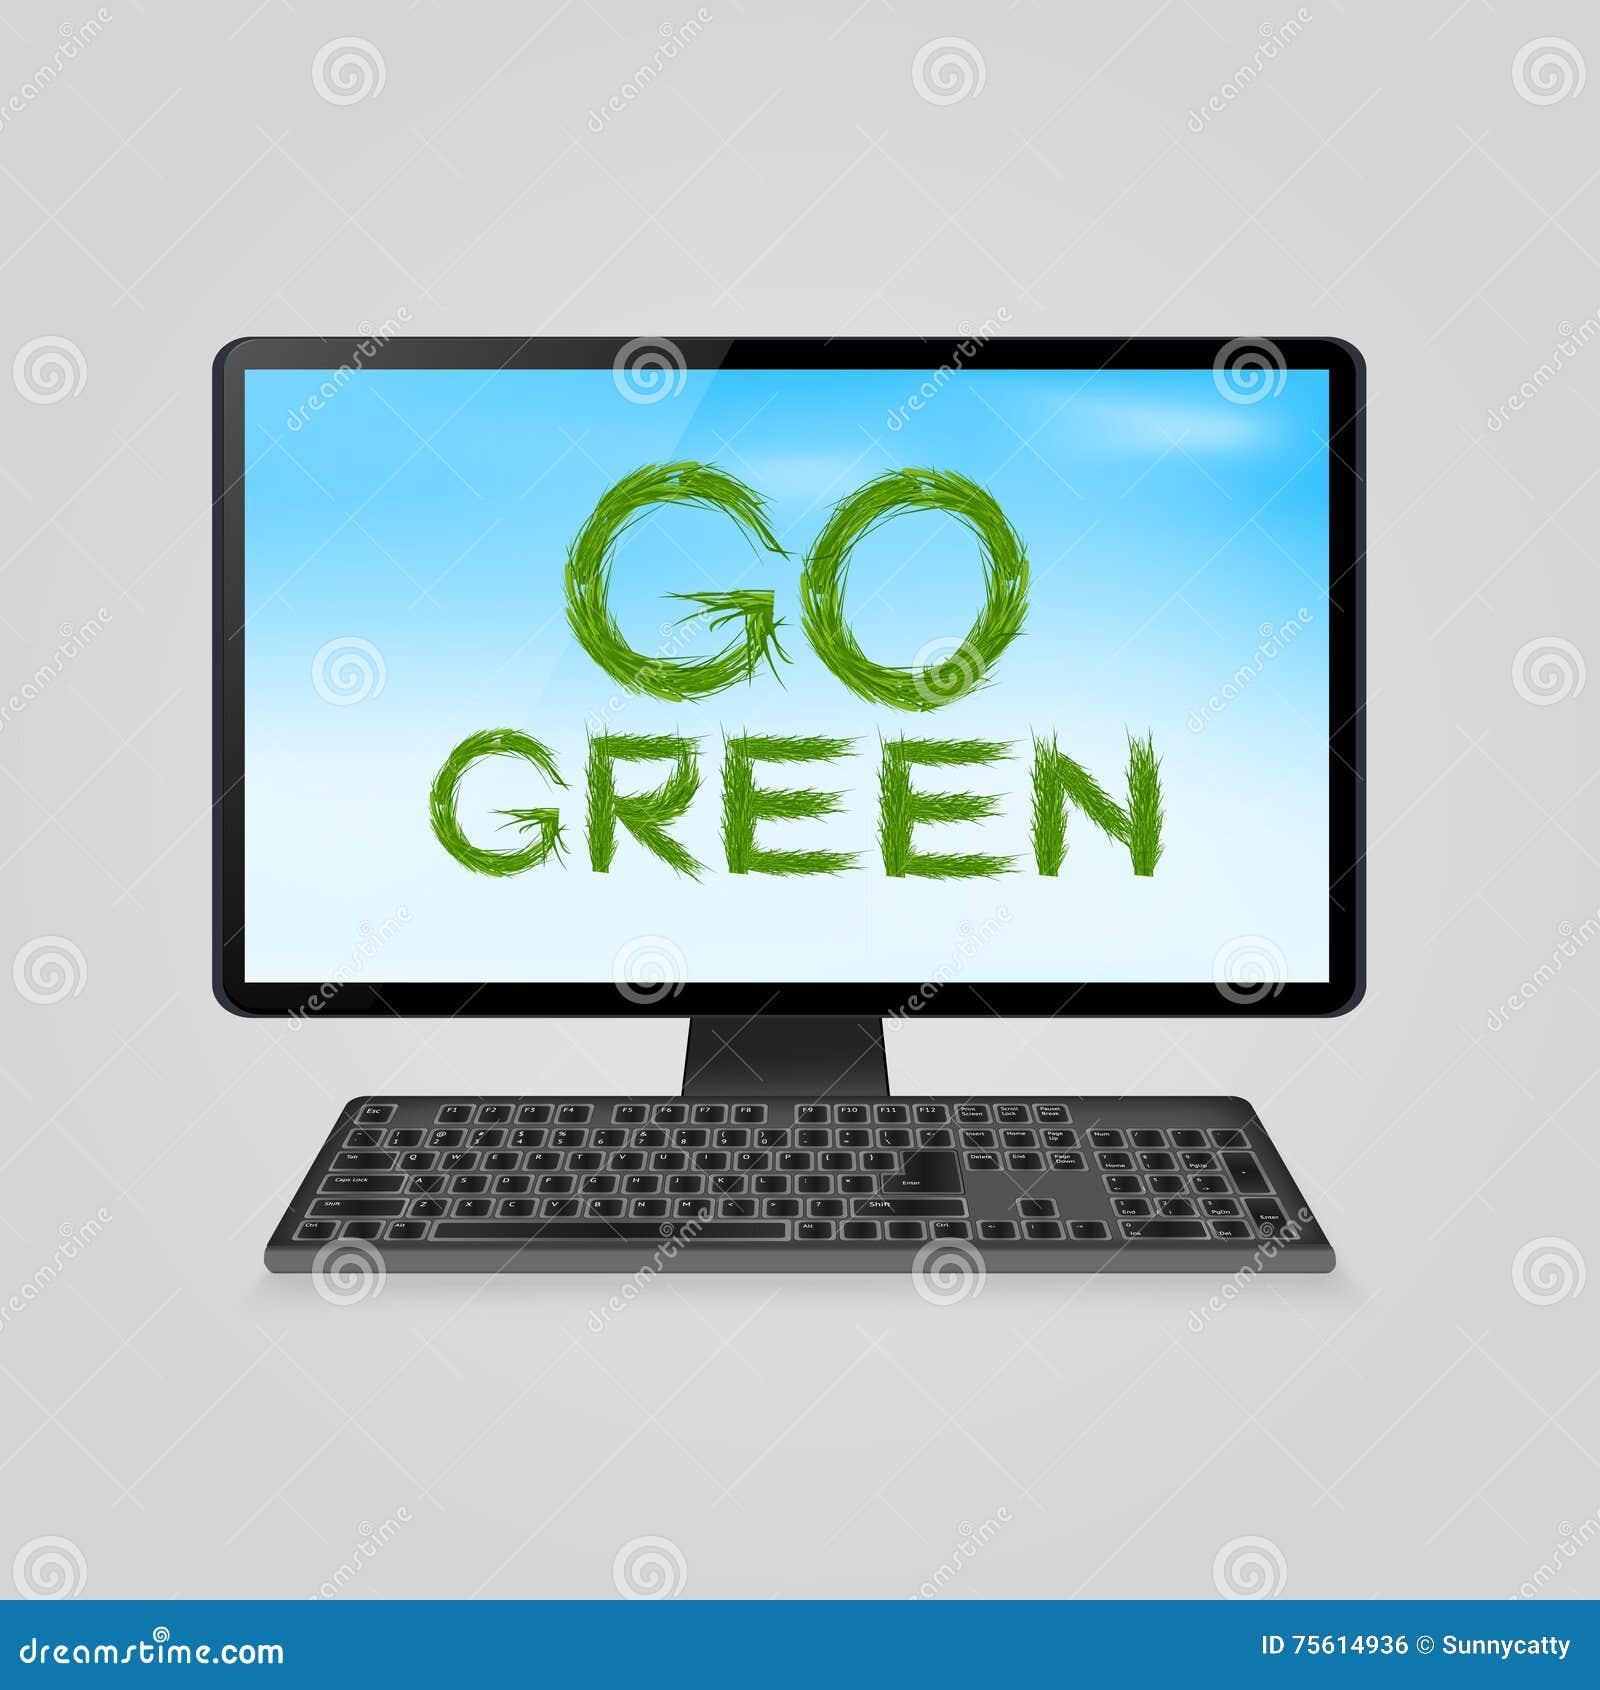 Environmental Concept Earthfriendly Landscapes: Environment Friendly Computer Cartoon Vector